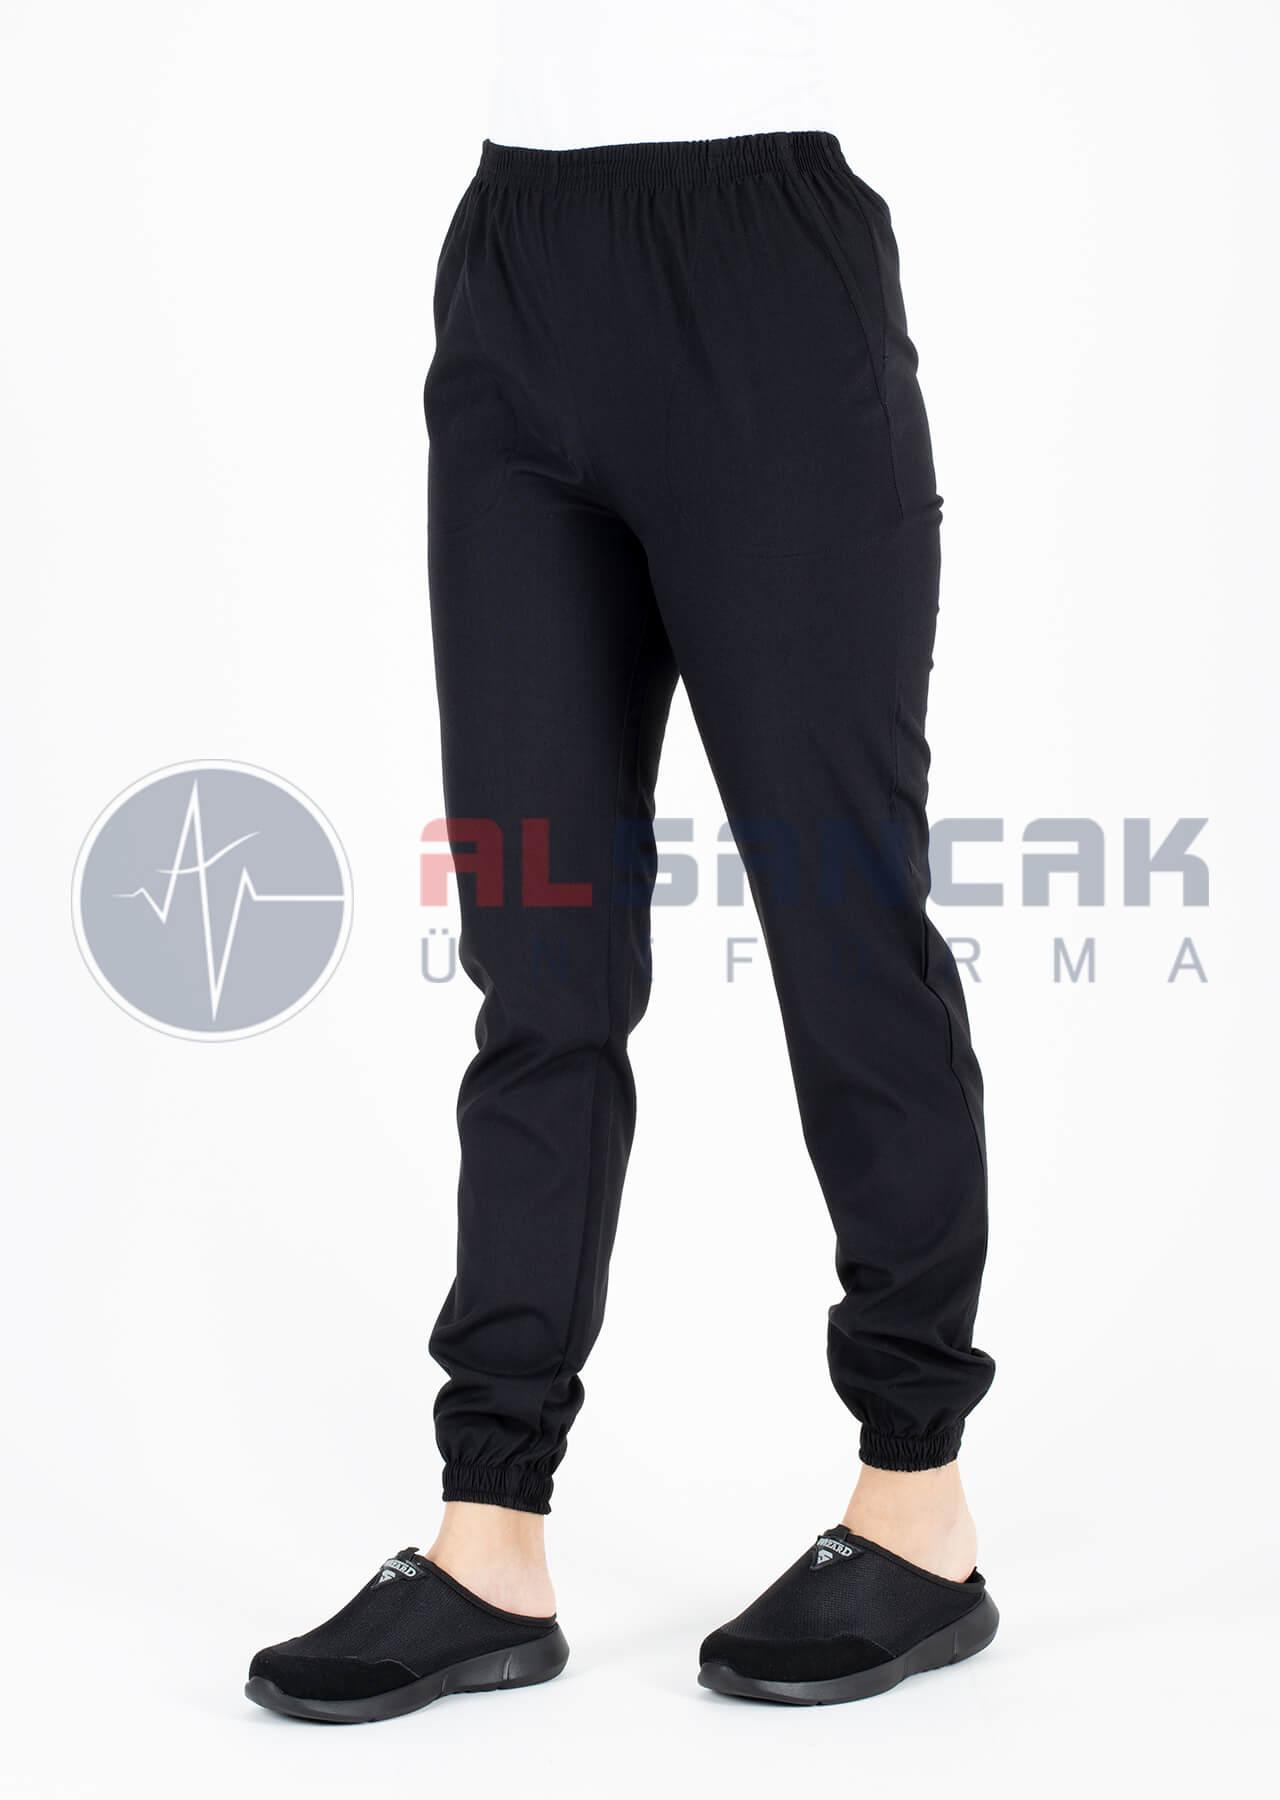 Siyah Likralı Sweat Doktor Hemşire Pantolonu